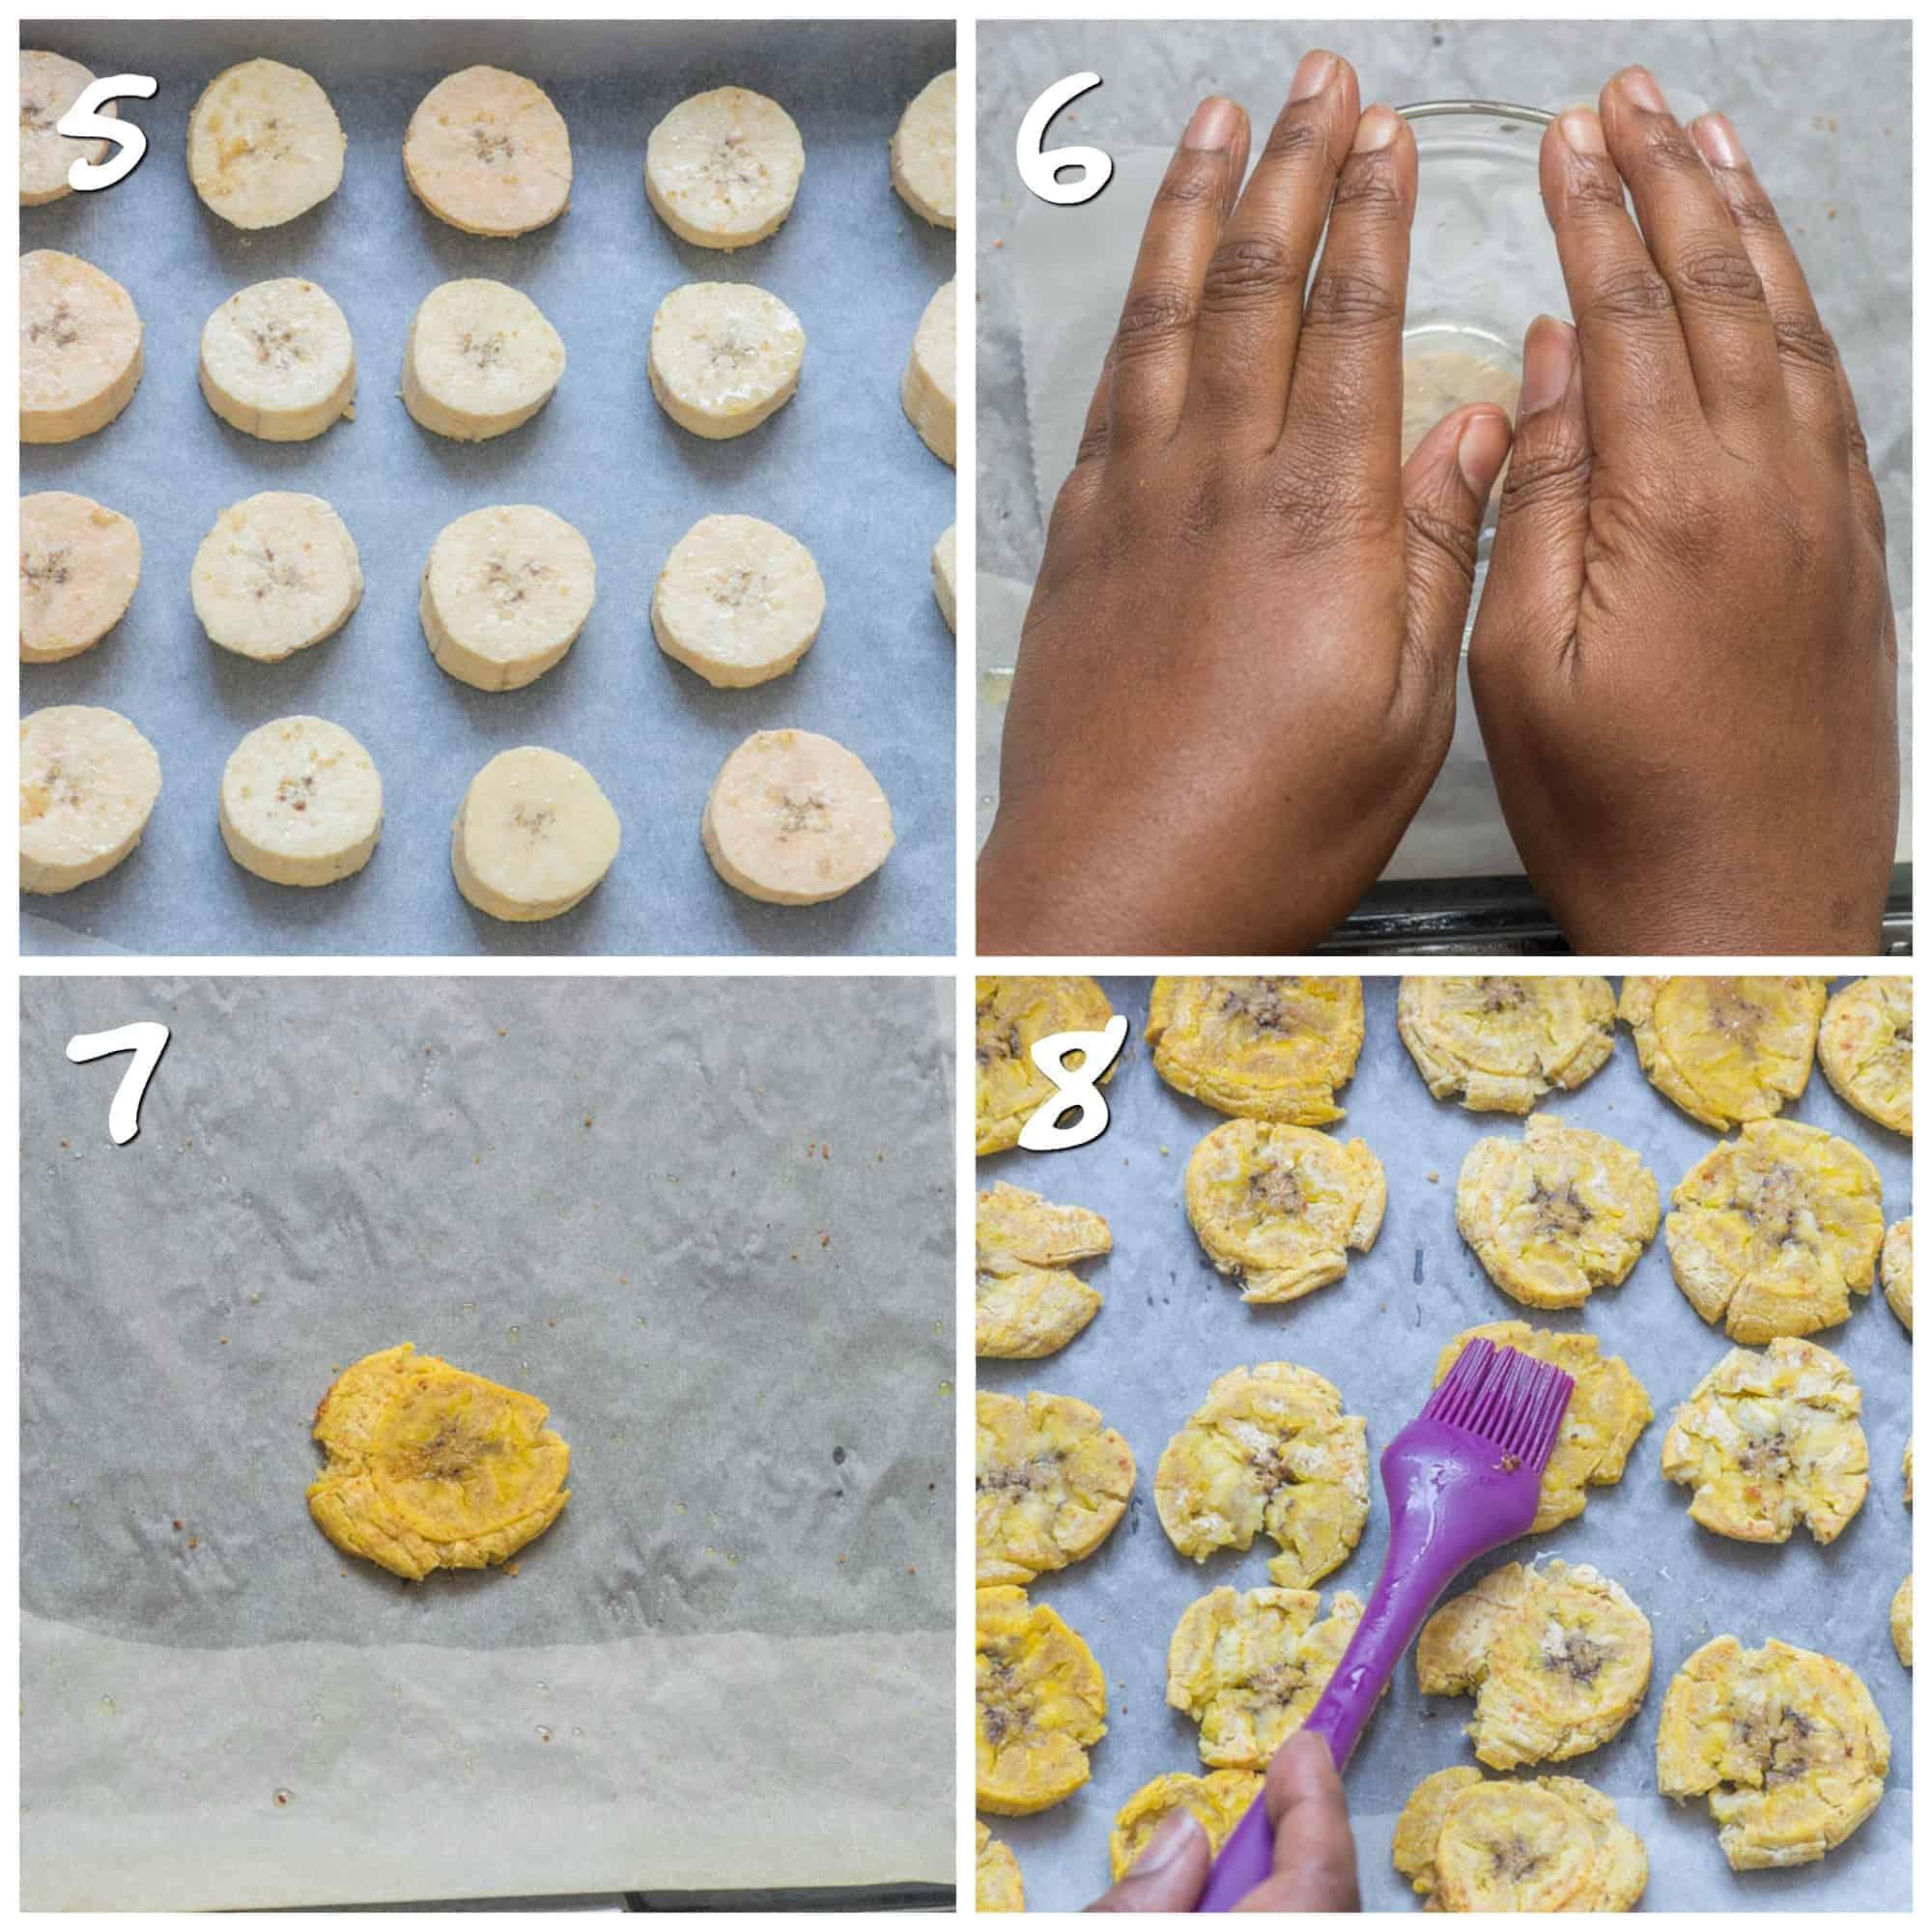 steps 5-8 baking the tostones